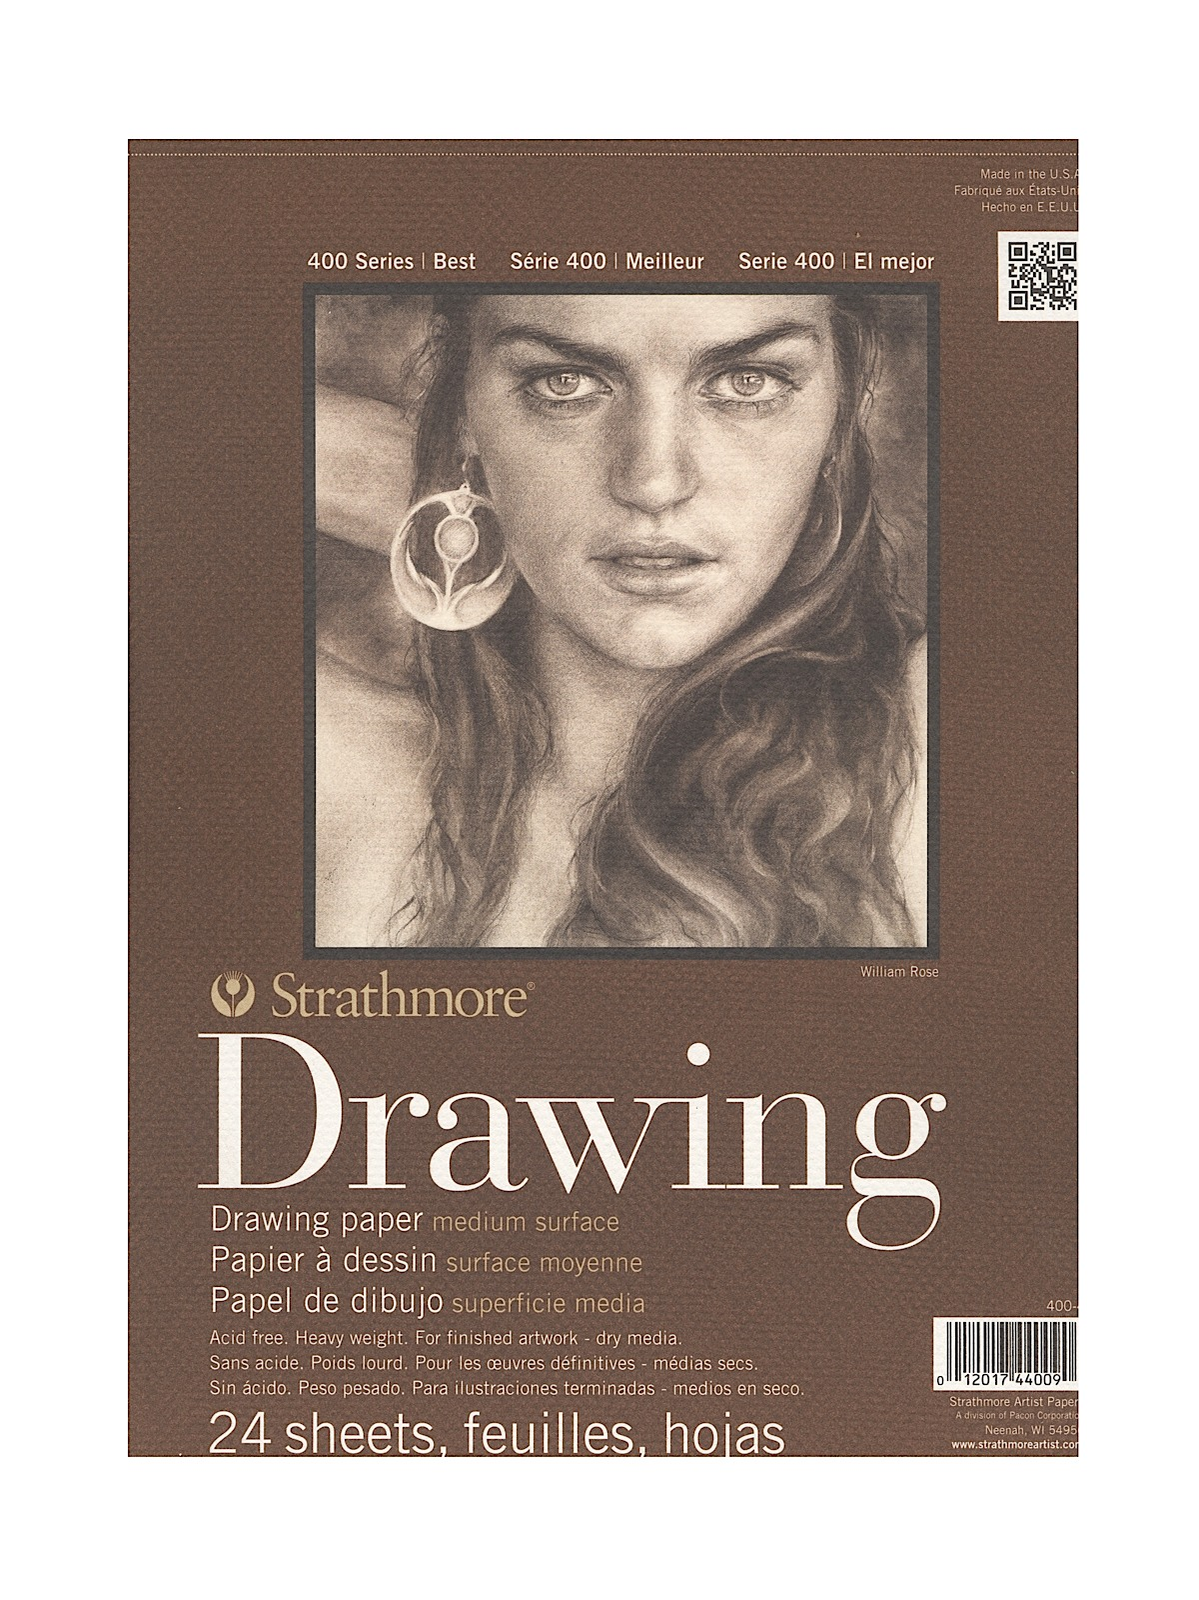 400 Series Drawing Paper Pad